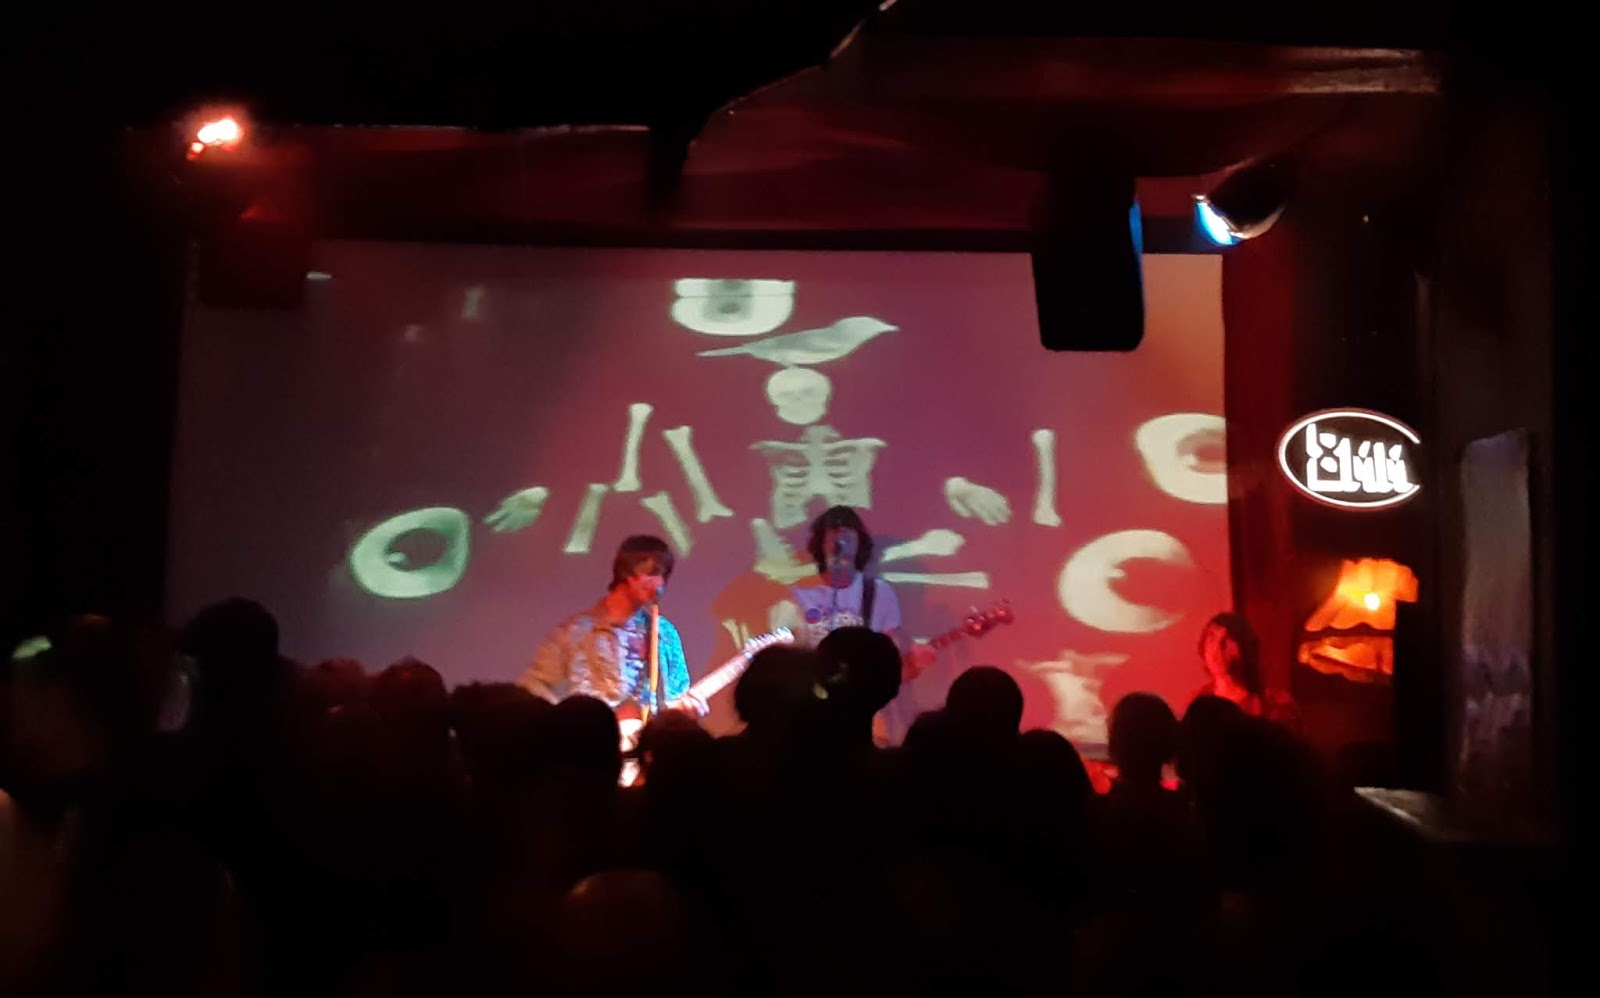 Patrick's Music Reviews: Love'n'Joy - Live 2019 04 25 8mm